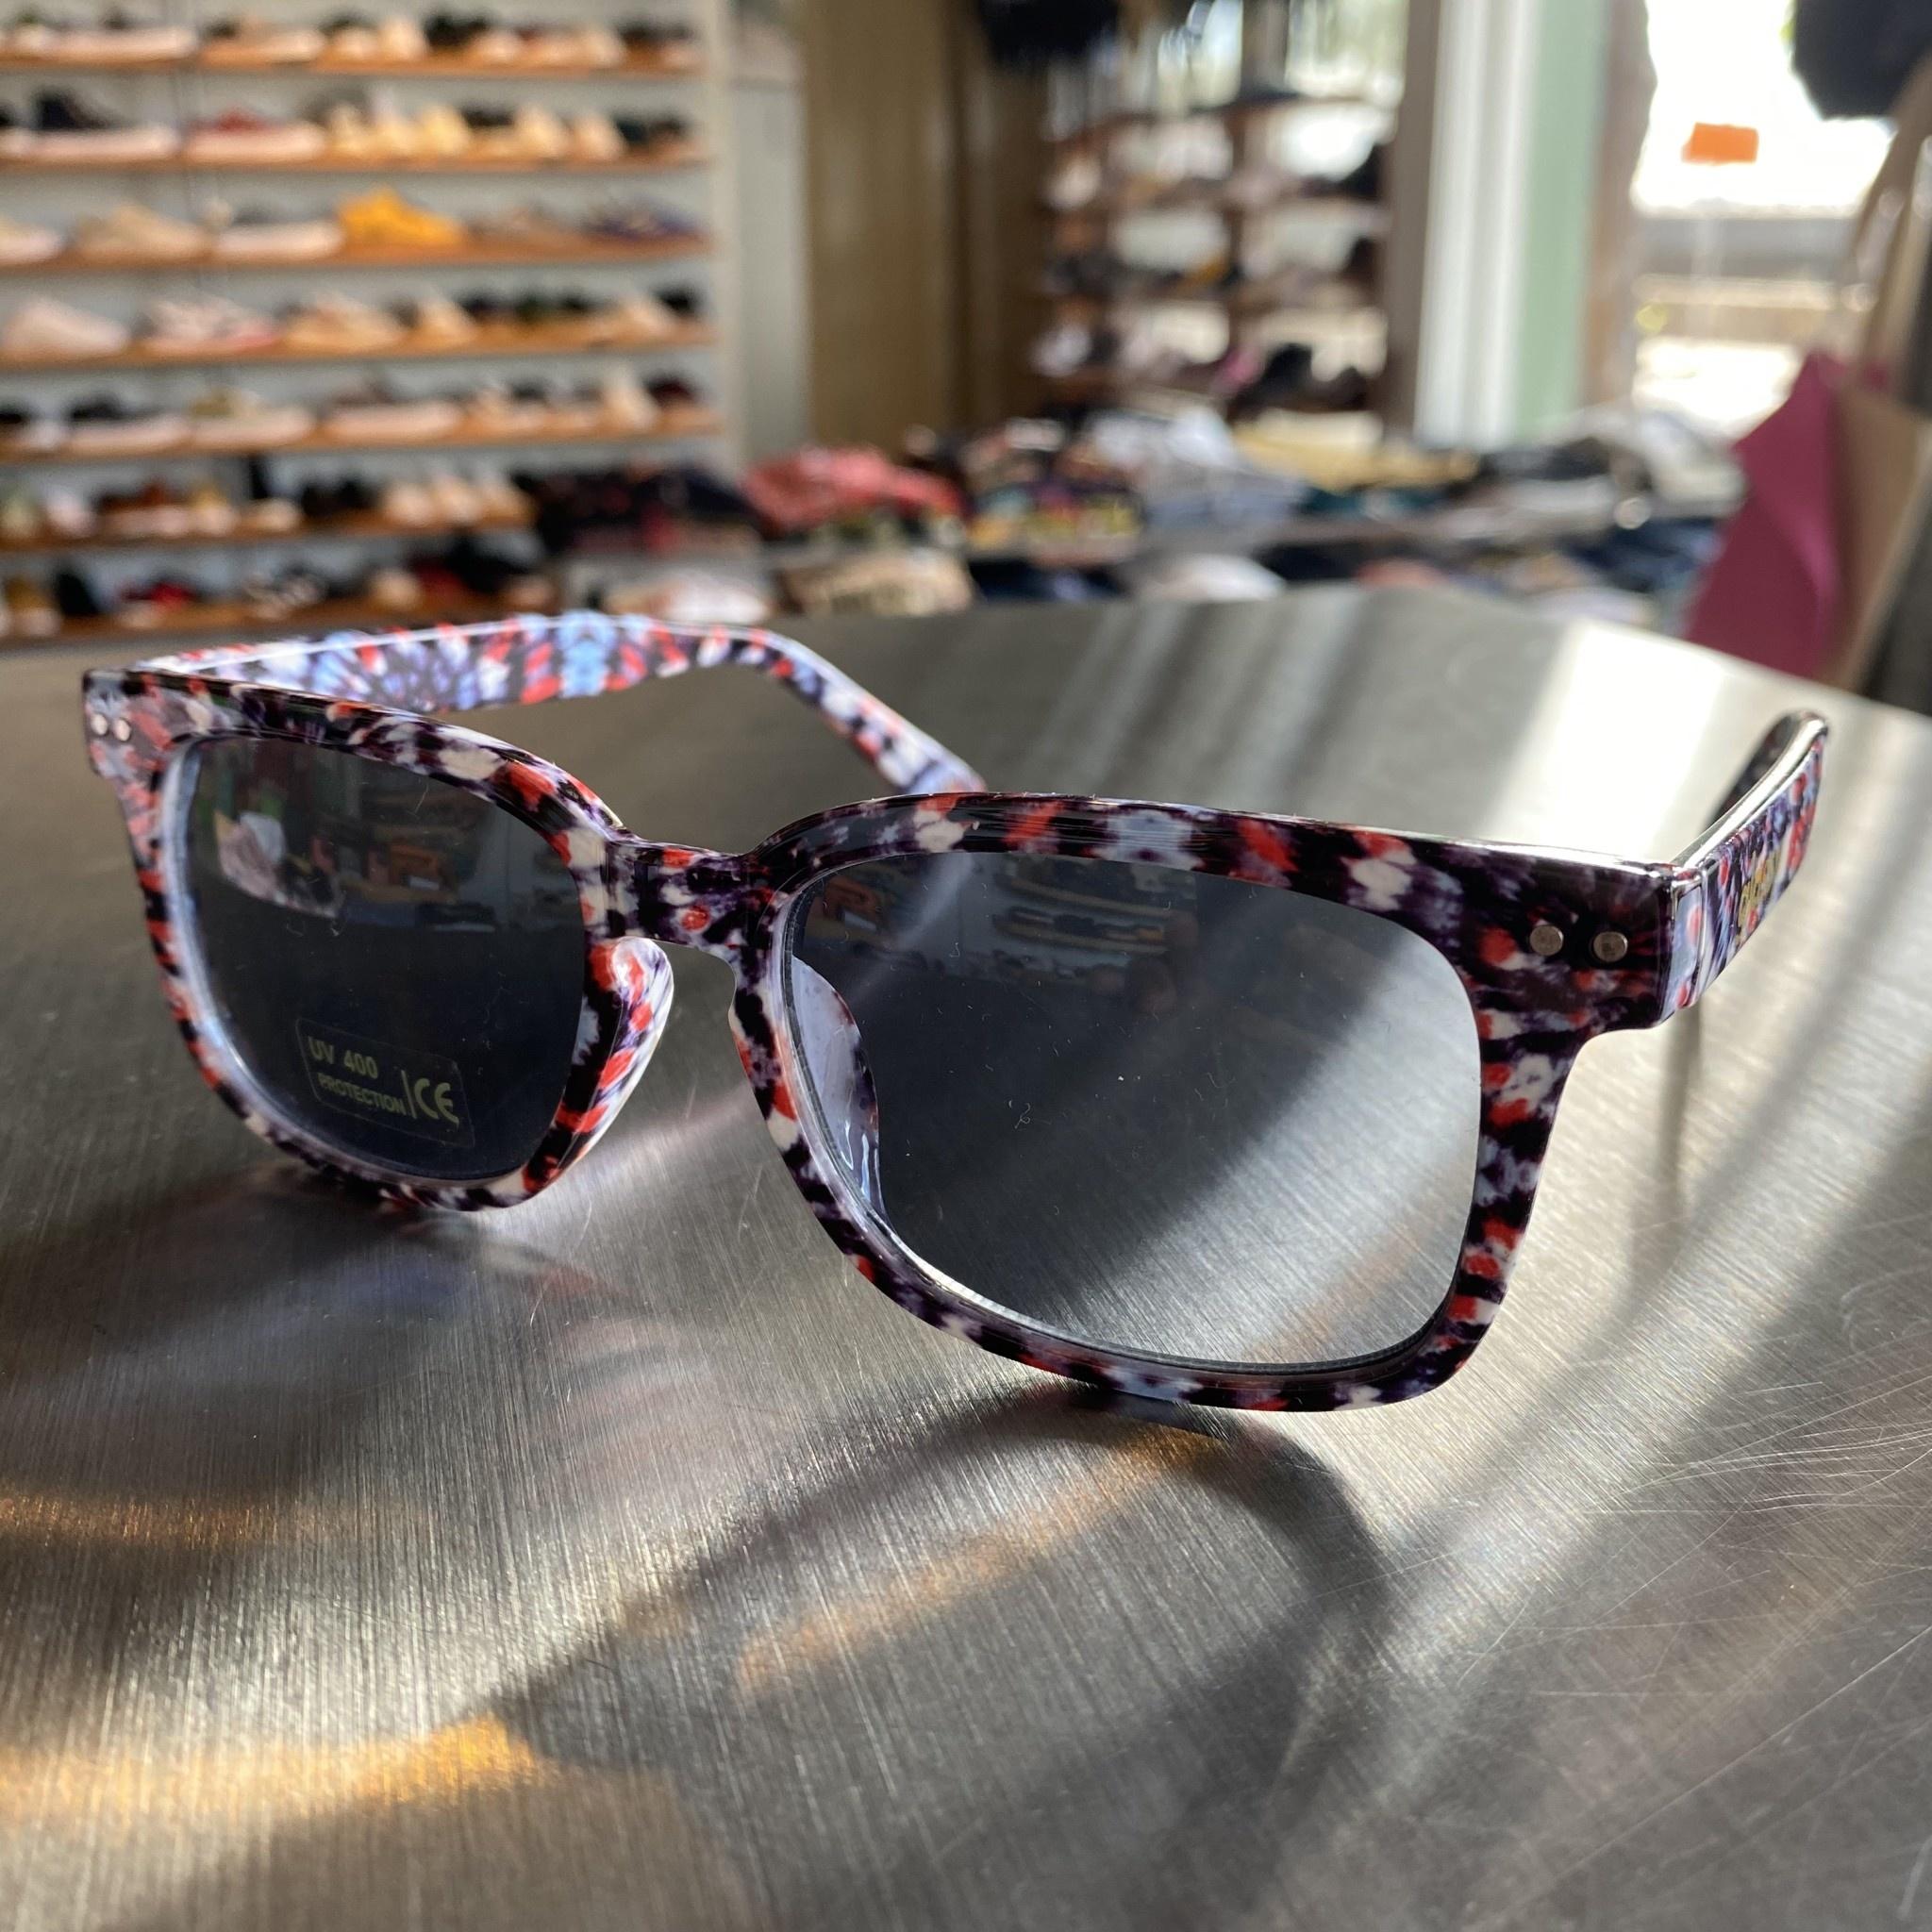 Glassy Sunglasses Lox Tie Dye